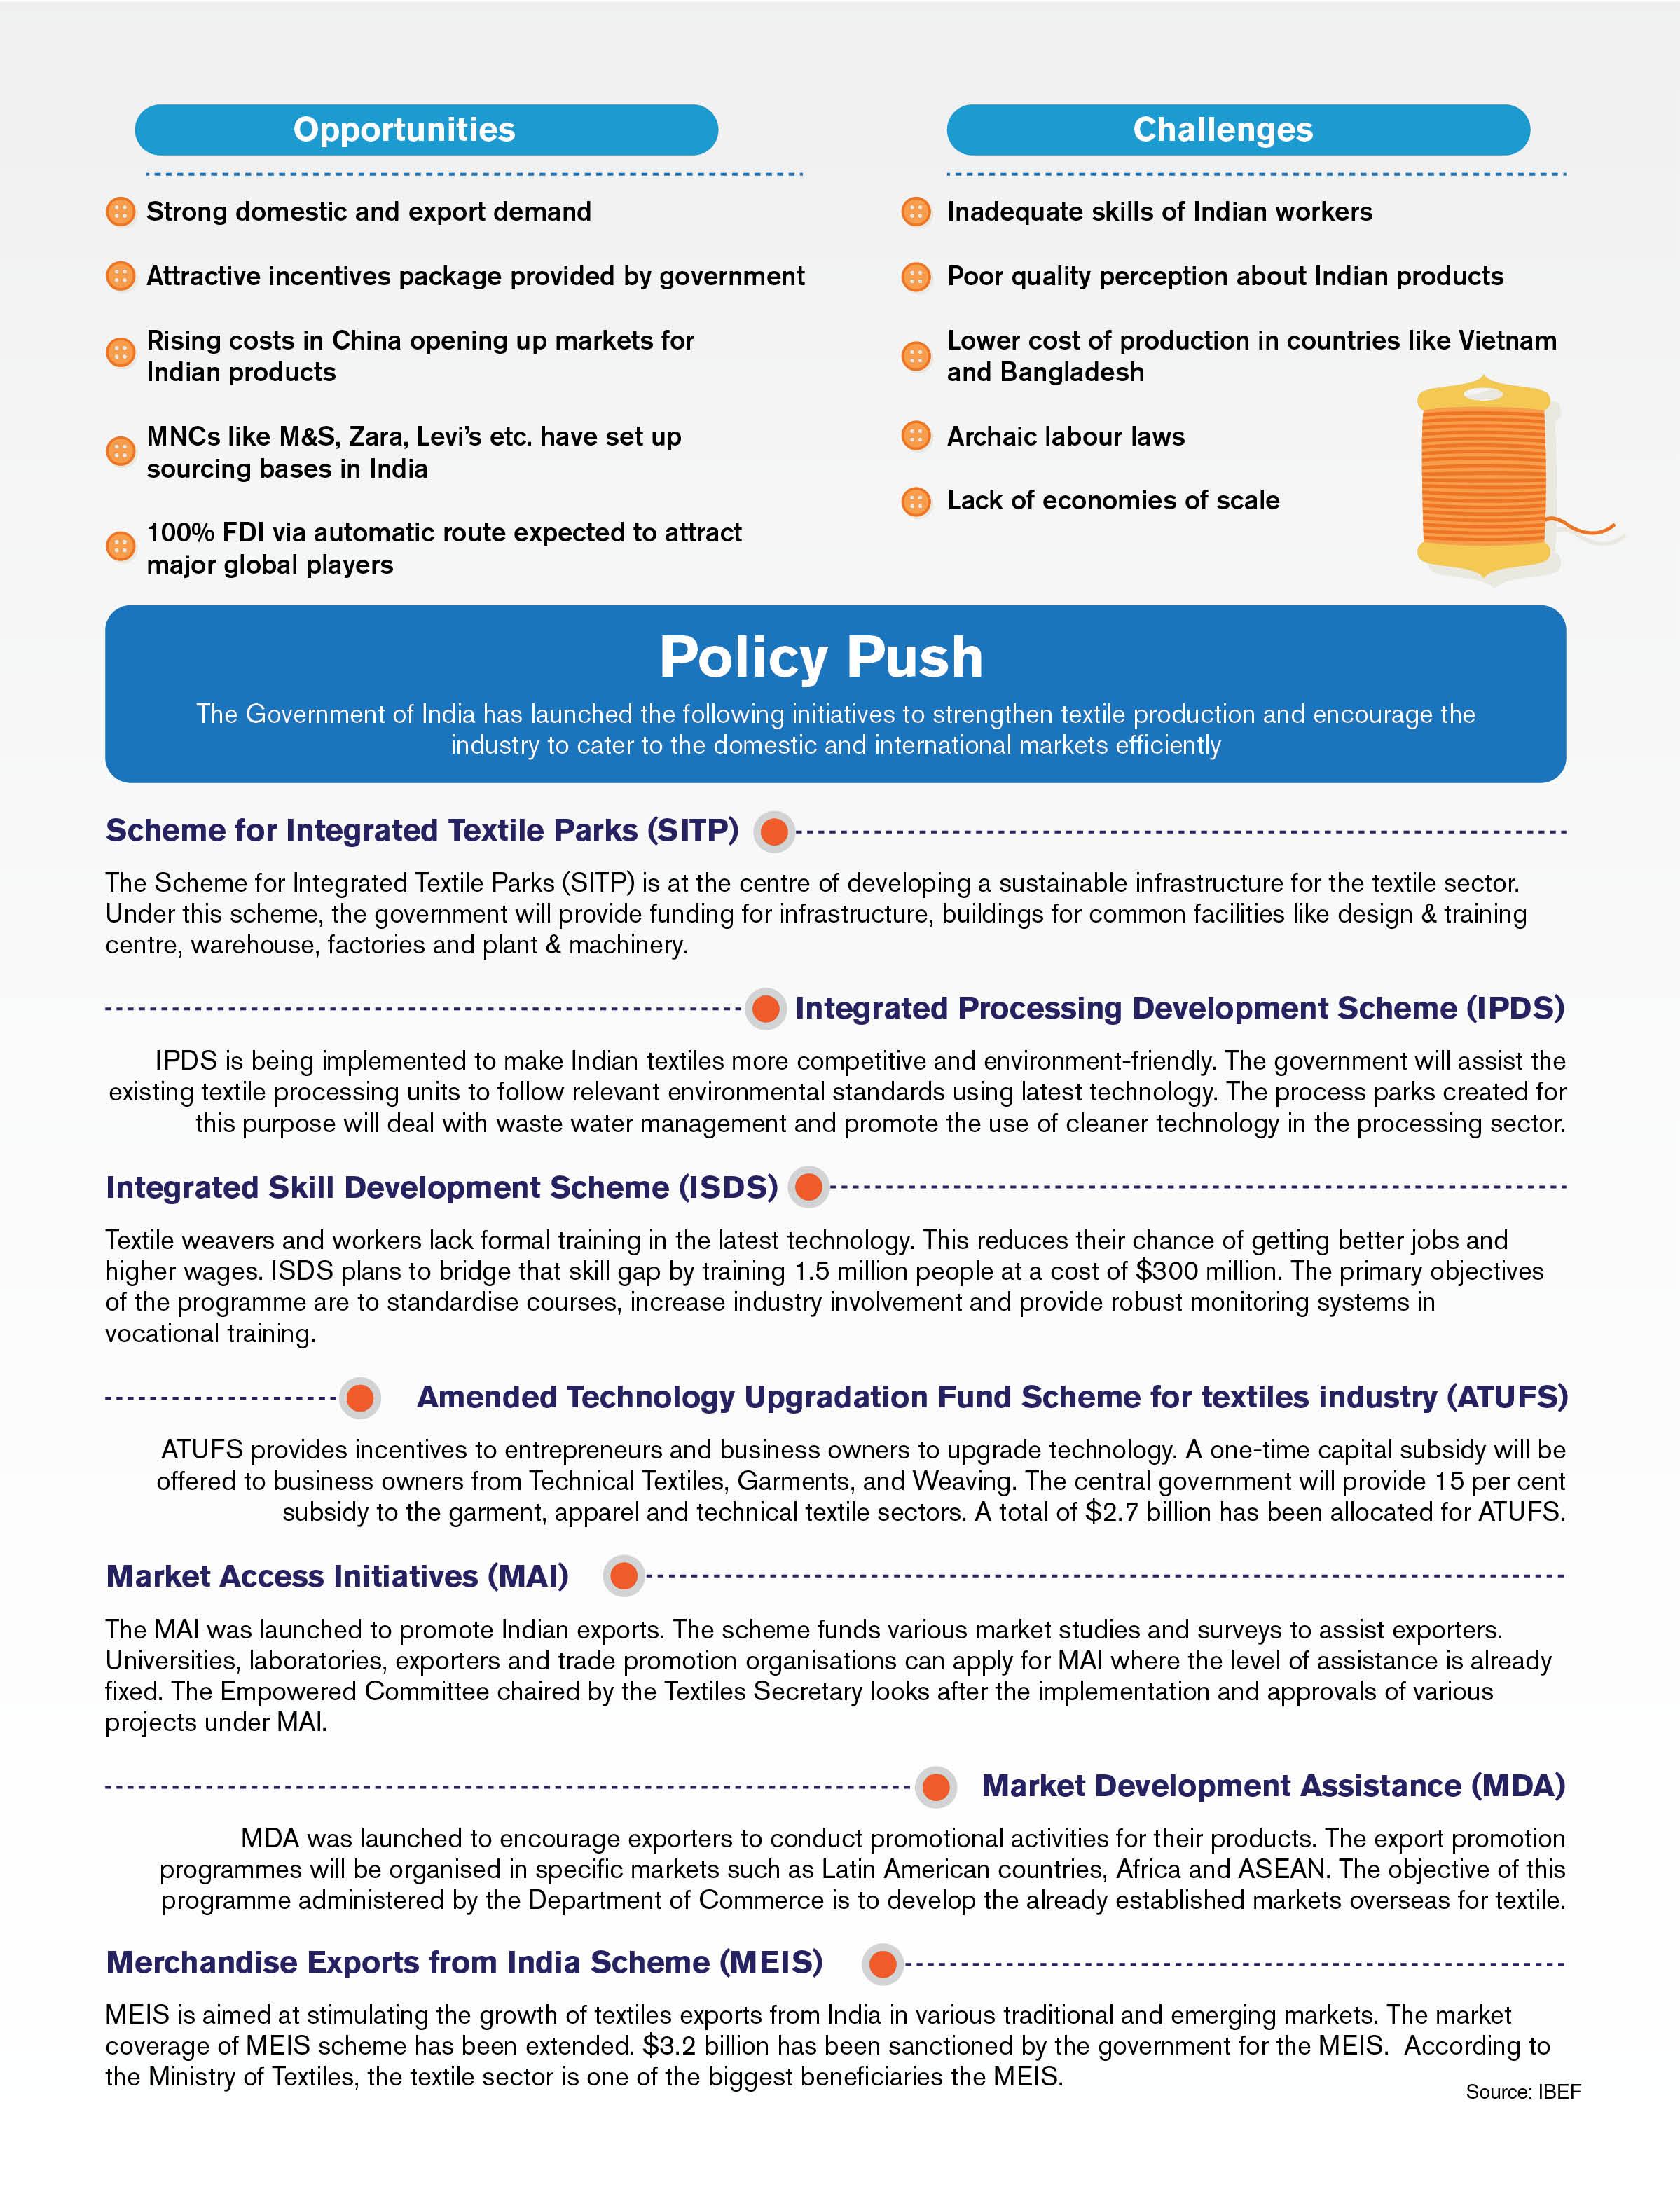 Policy Push